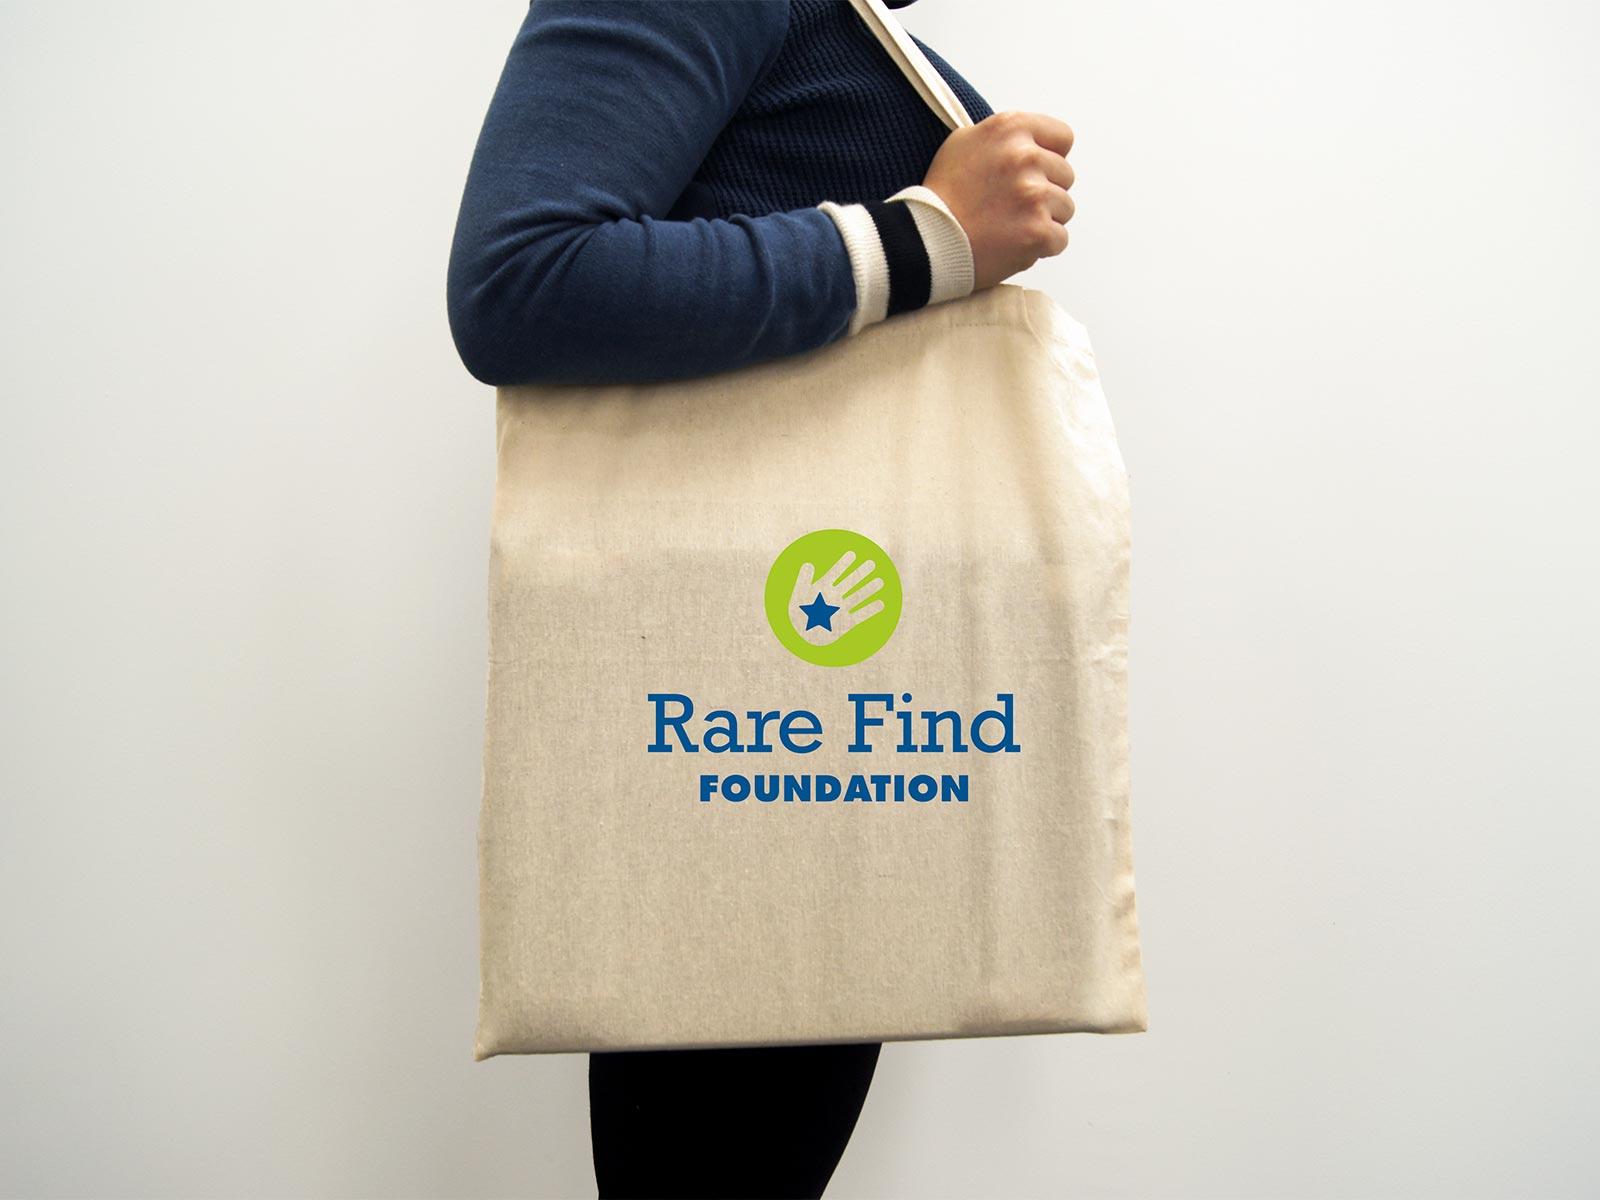 Rare Find Foundation tote bag